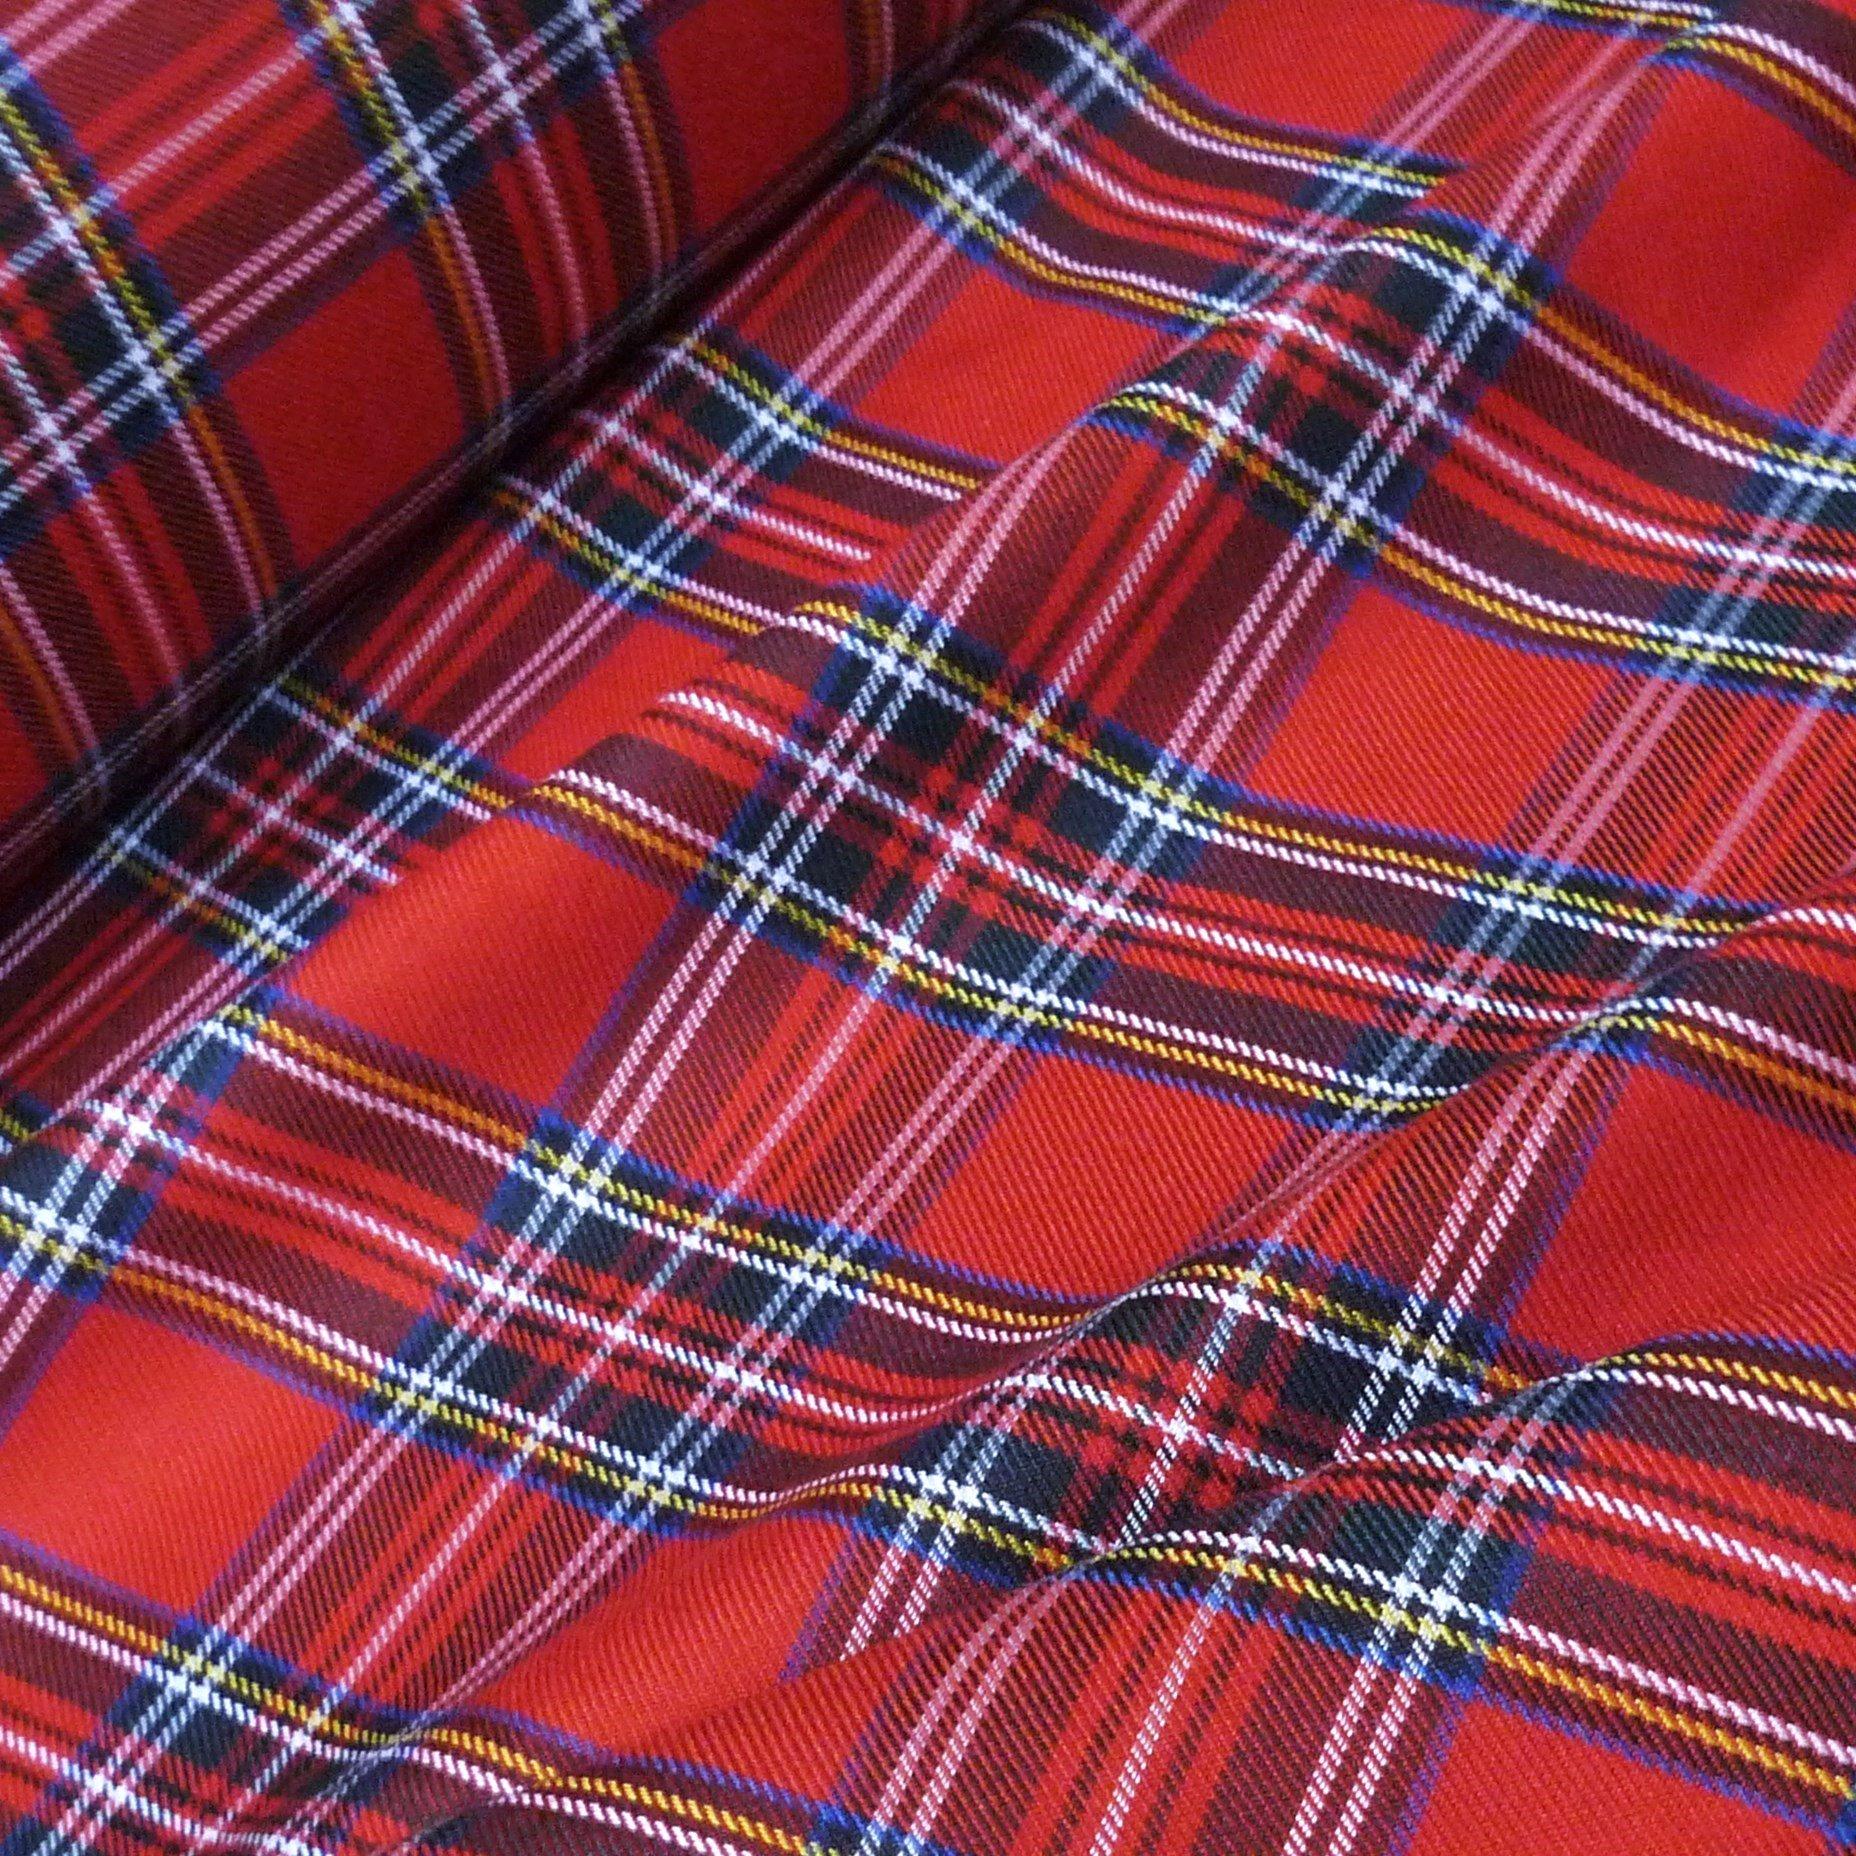 Nortex Mill Red & Black Royal Stewart Poly-Viscose Tartan Fabric (Per Metre)